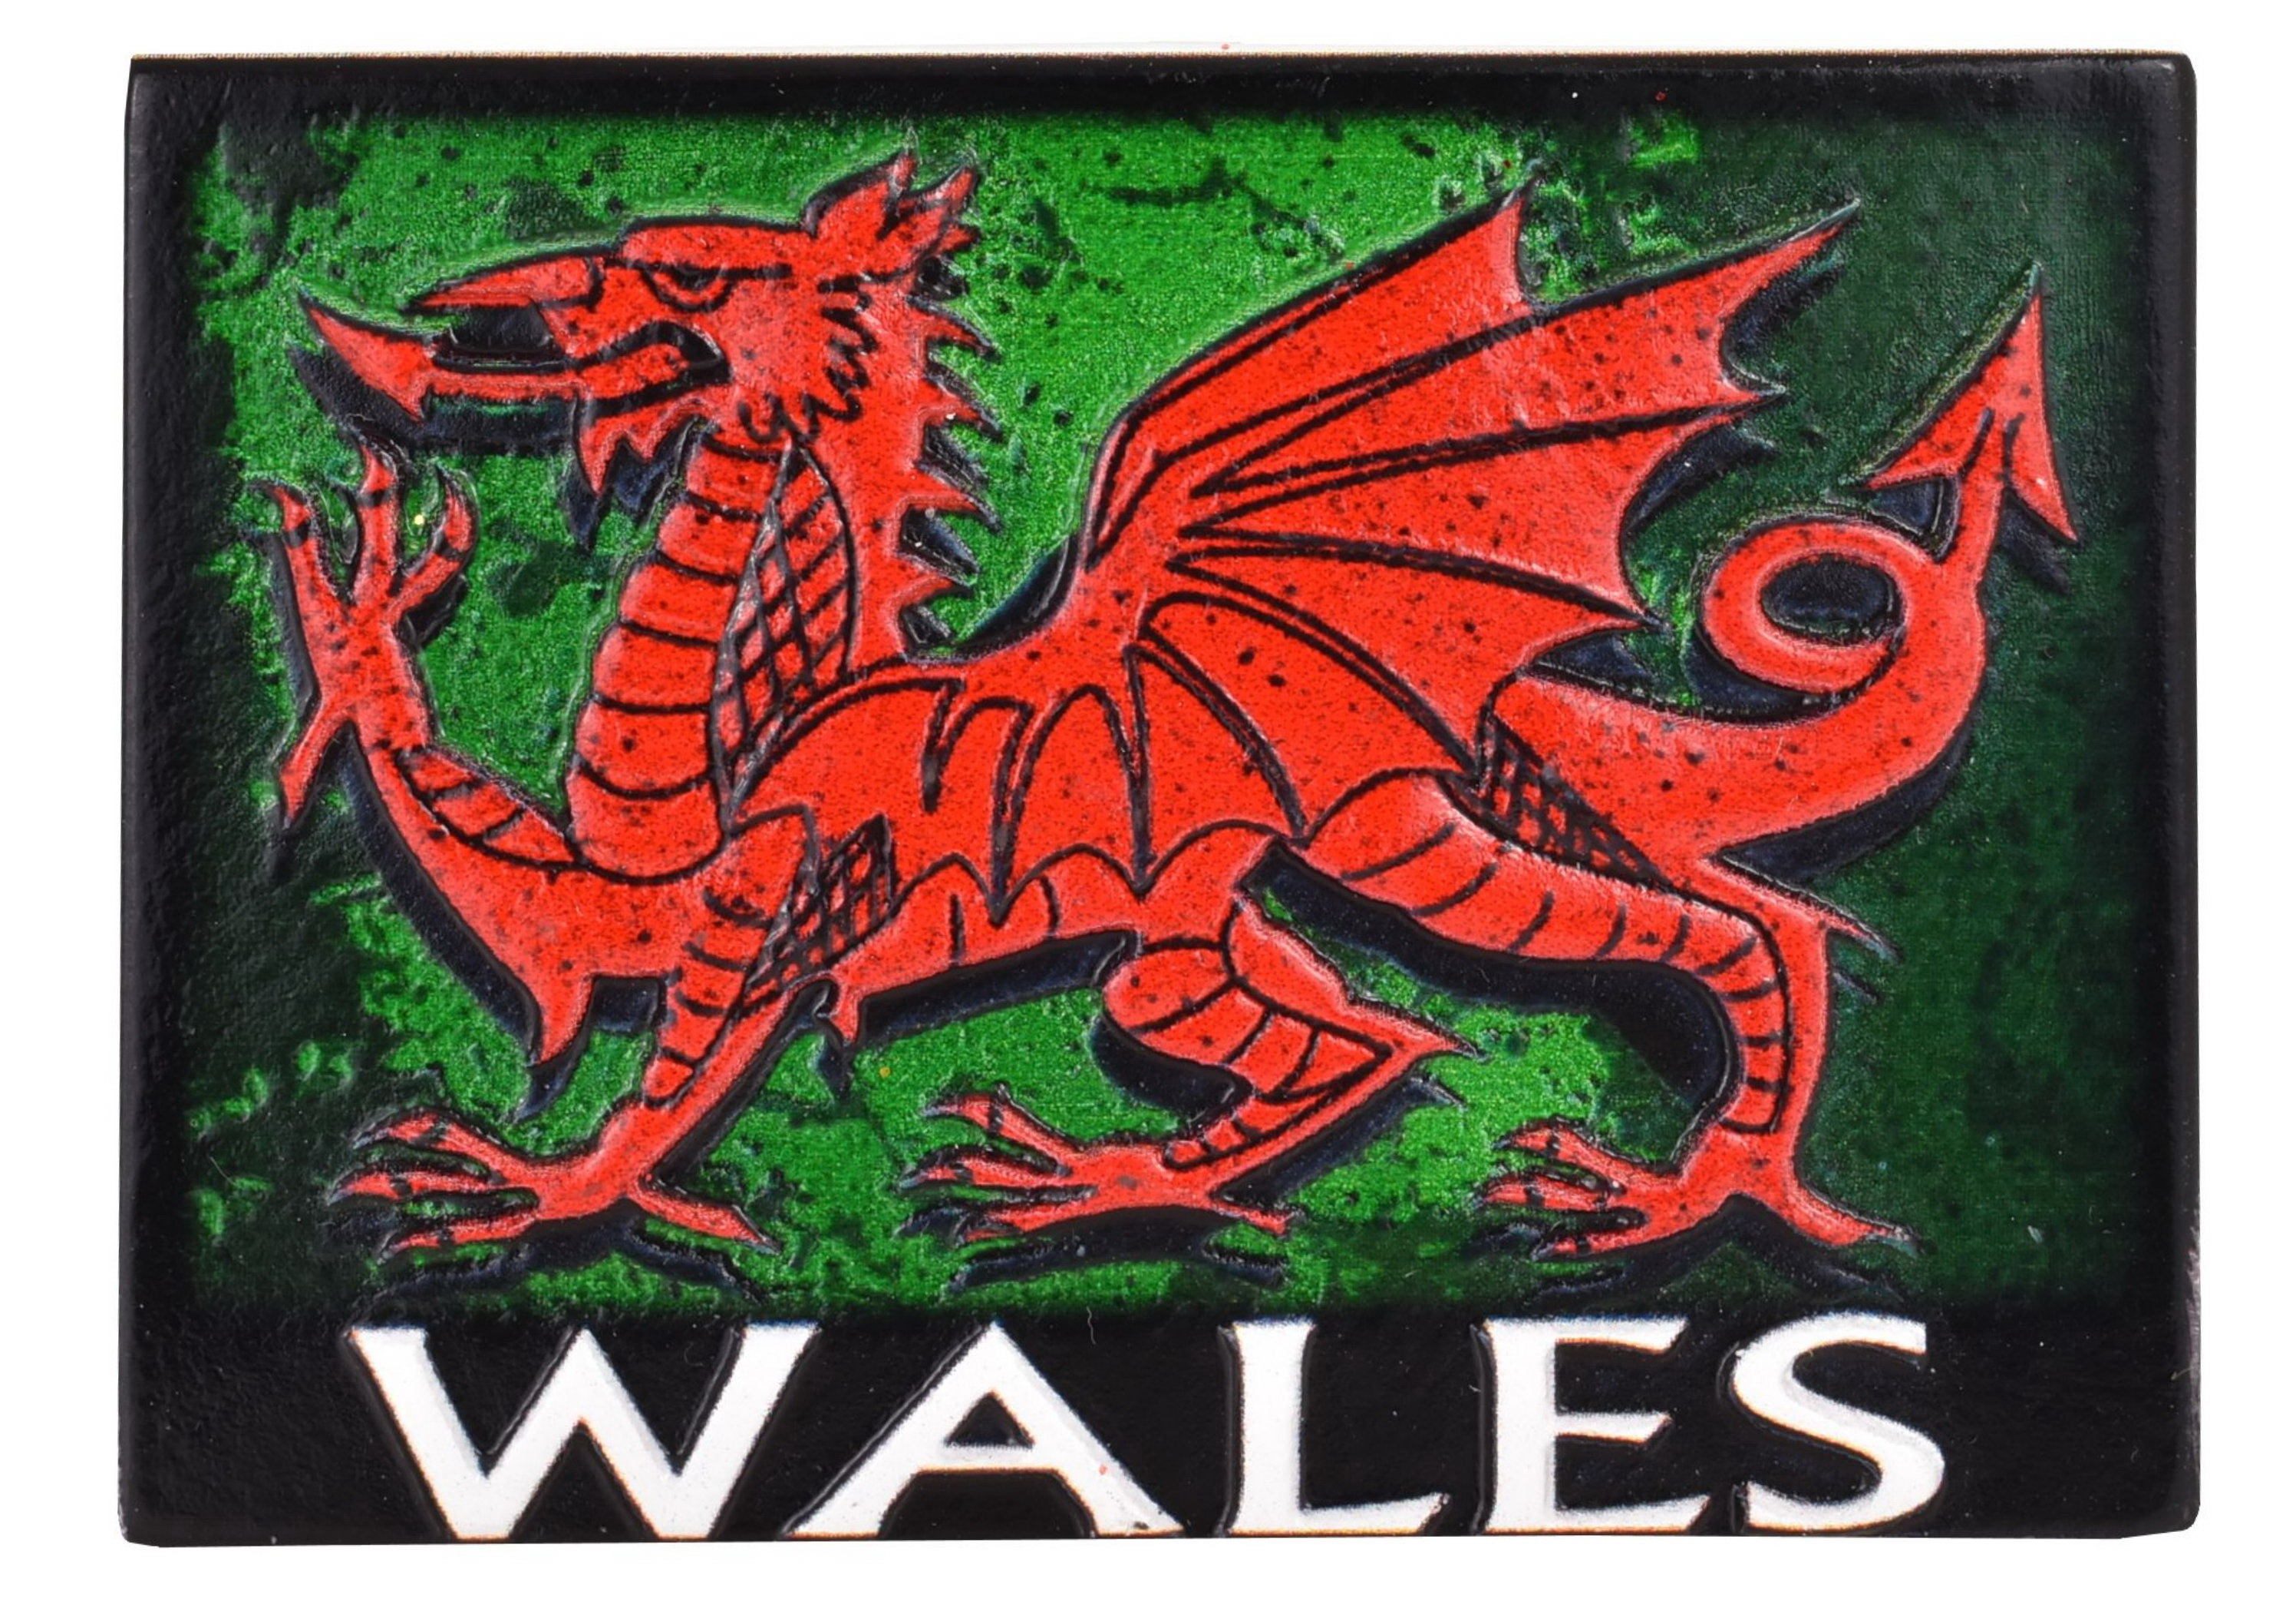 Wales Resin Magnet Dragon Design Printed